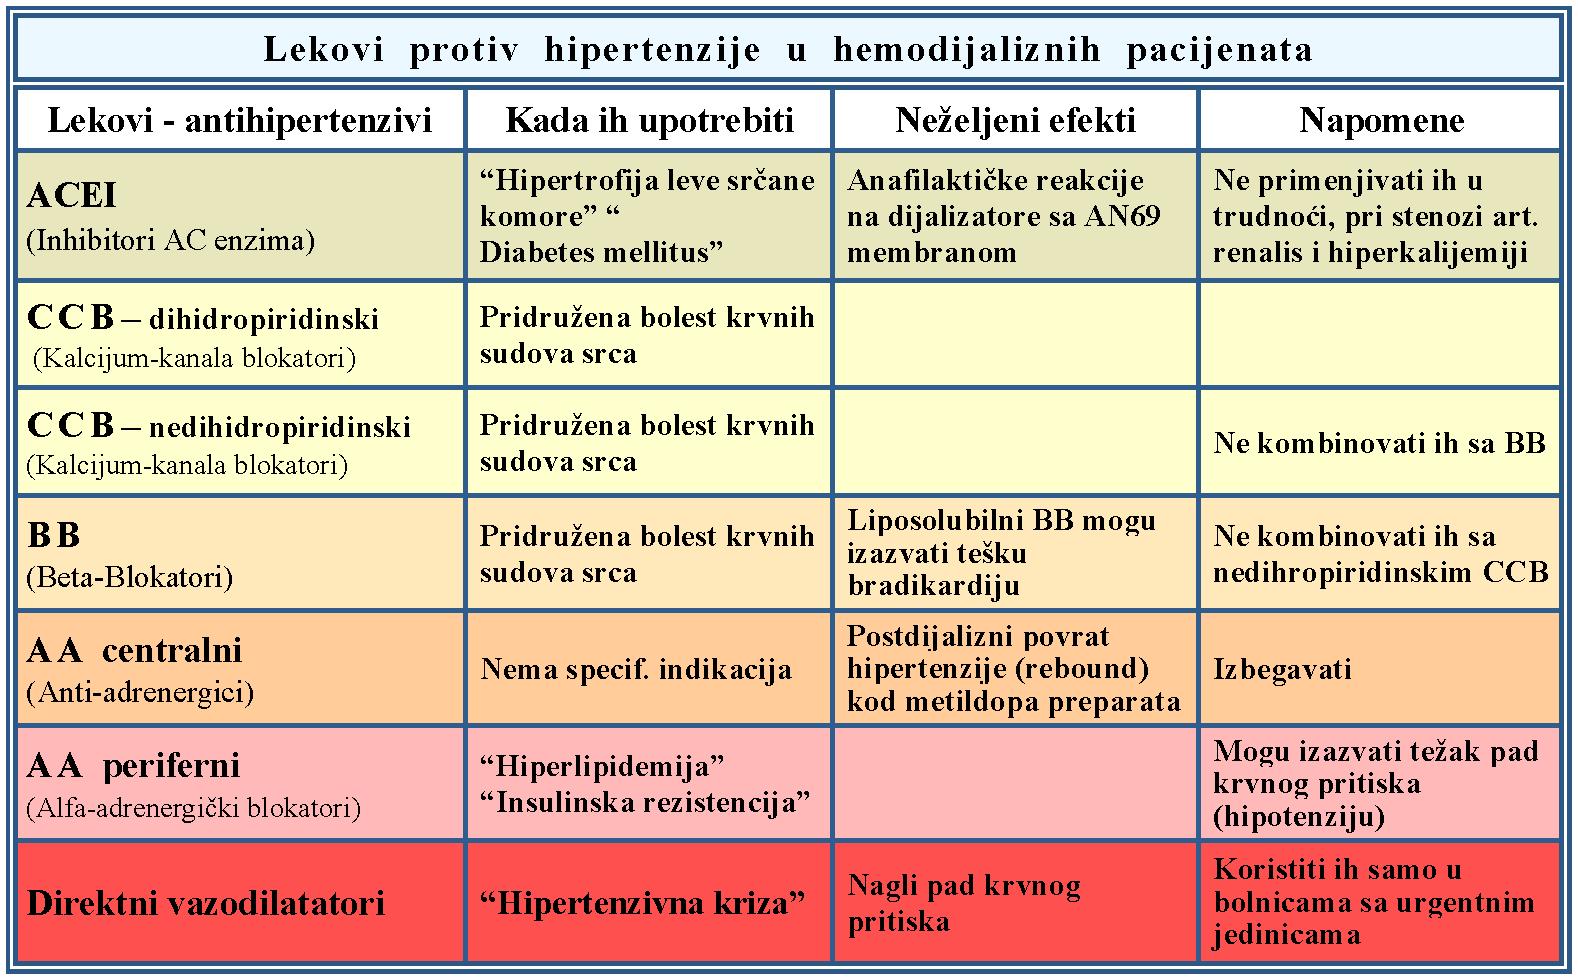 hipertenziju i bradikardiju)